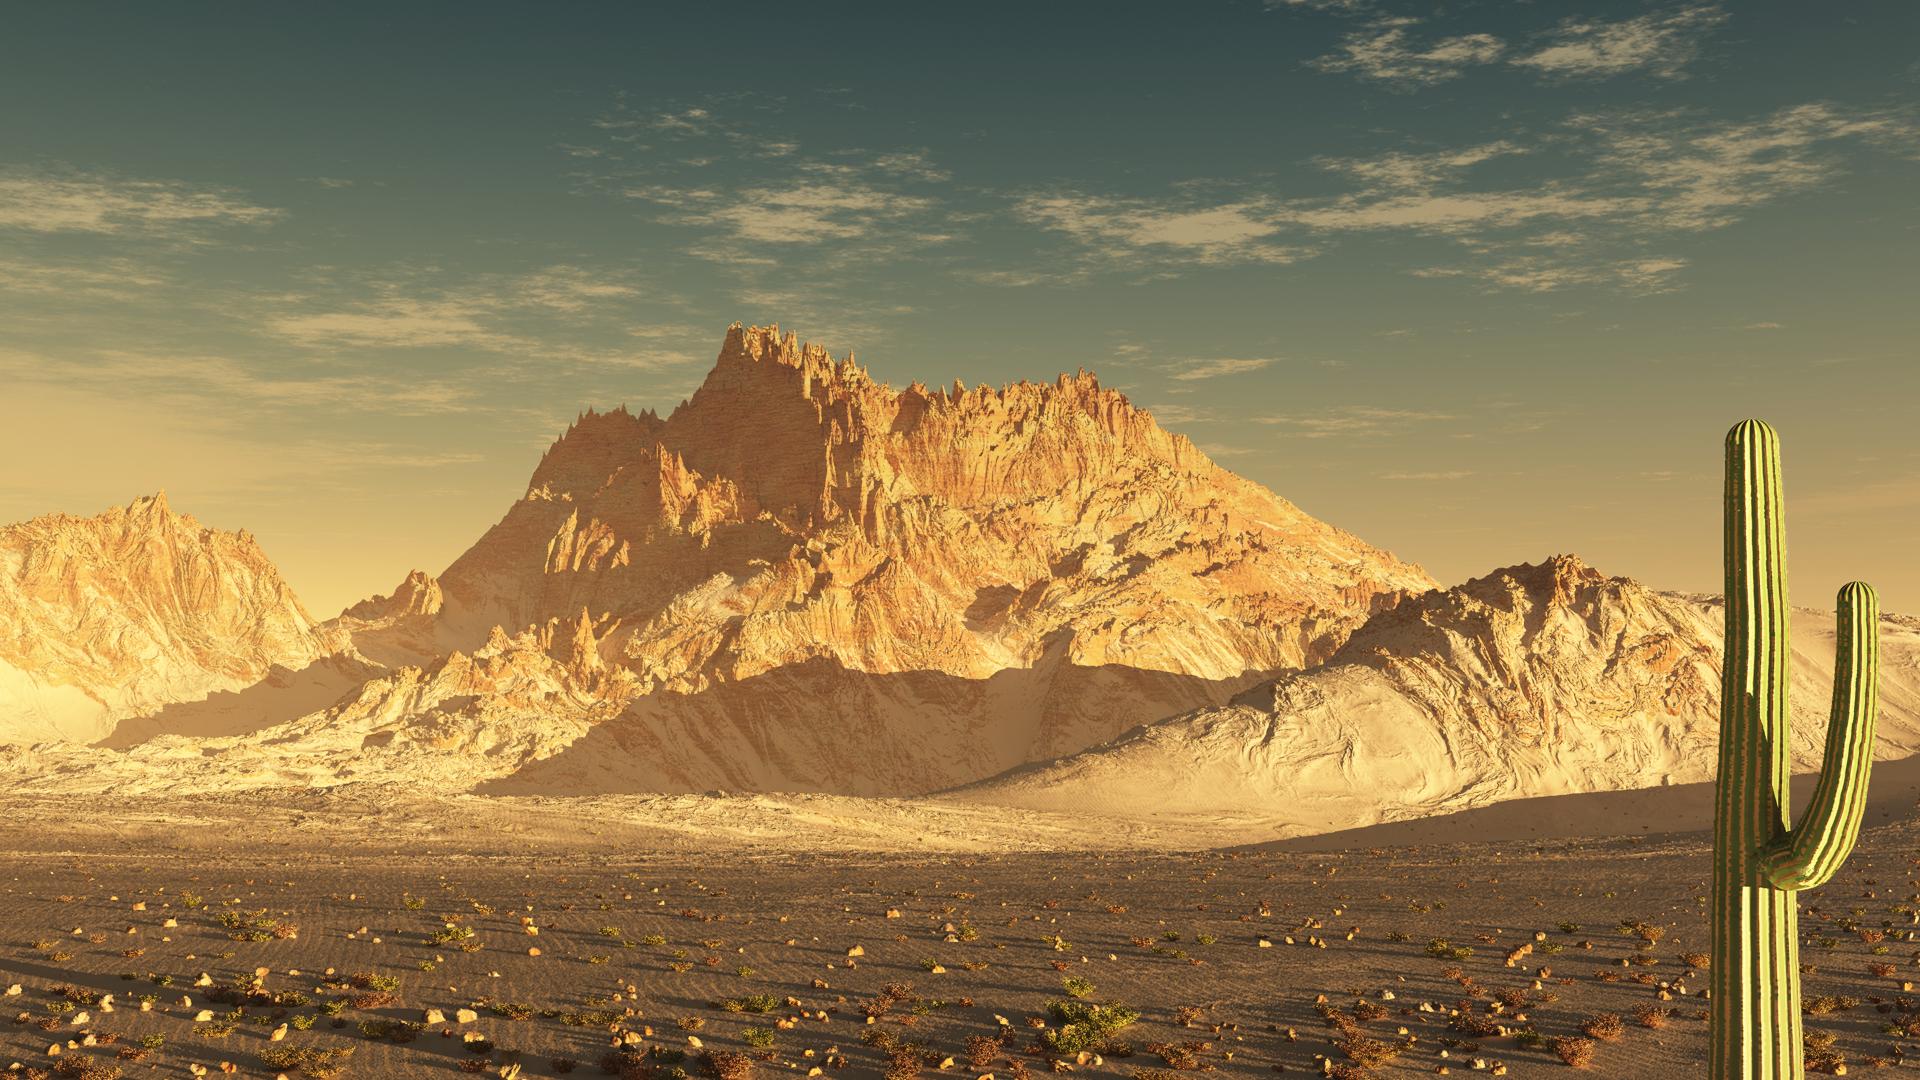 Sonoran Desert HD Pictures 1920x1080